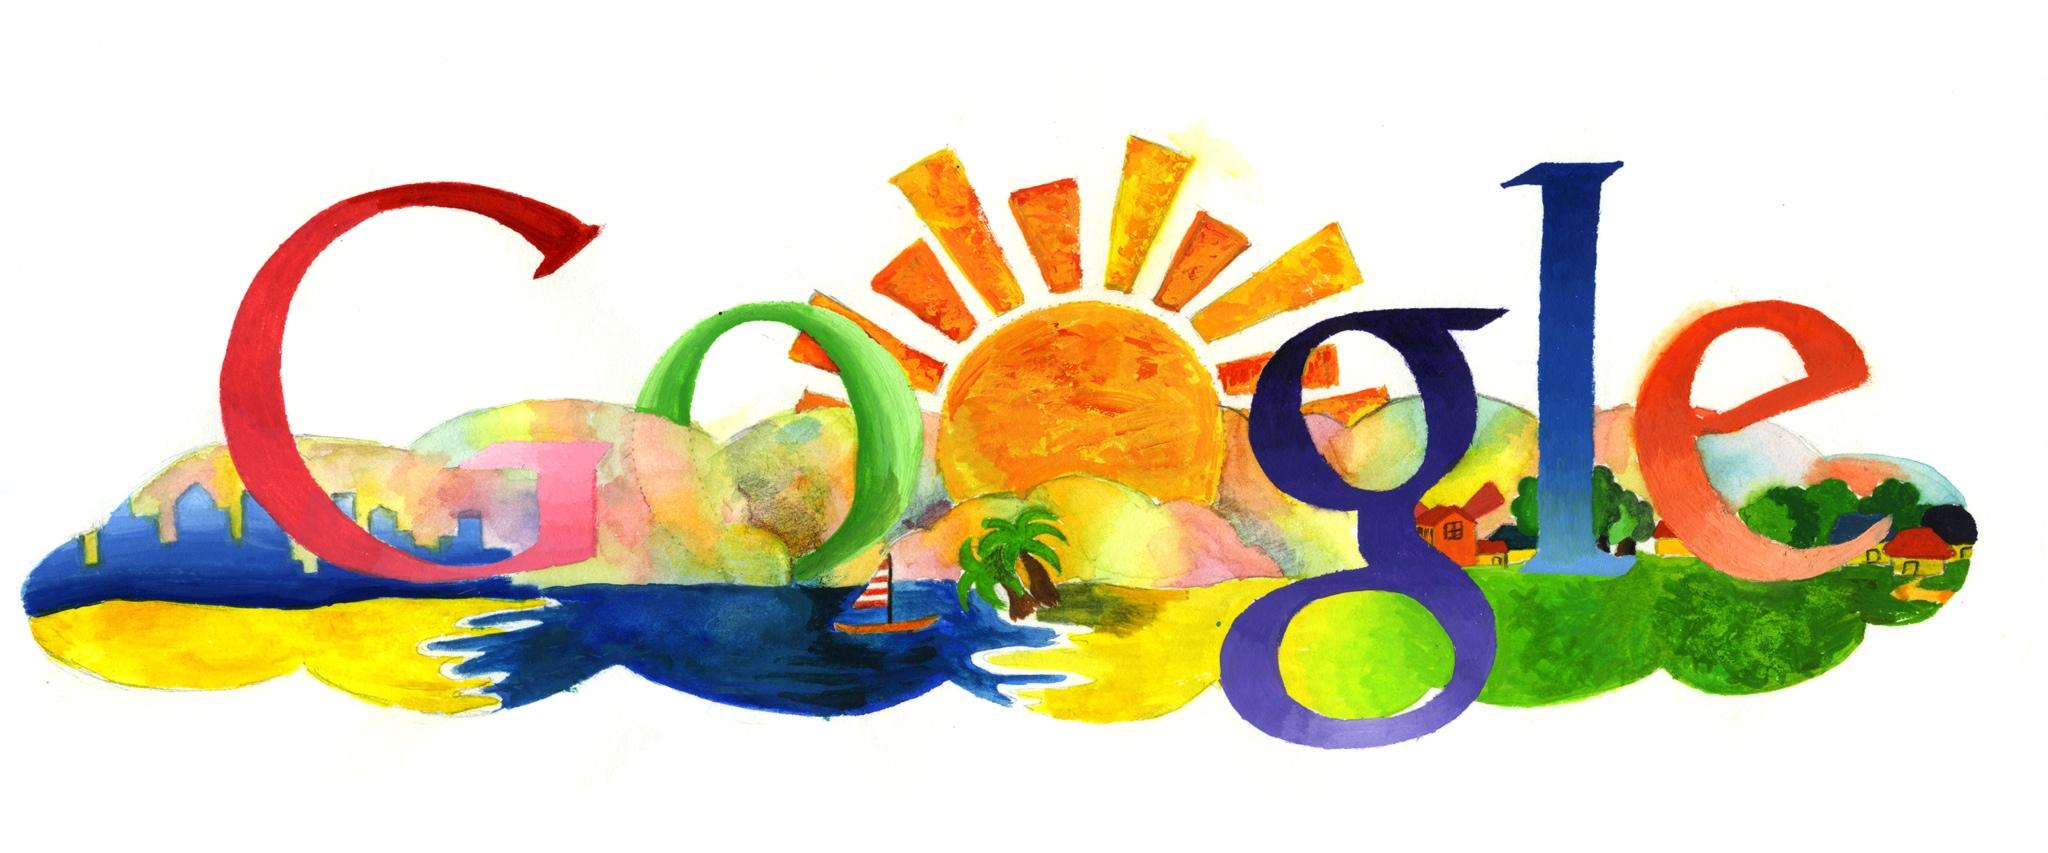 Contest time clipart picture freeuse download Google\'s Doodle 4 Google Logo Contest: Get Doodling, Kids | TIME ... picture freeuse download